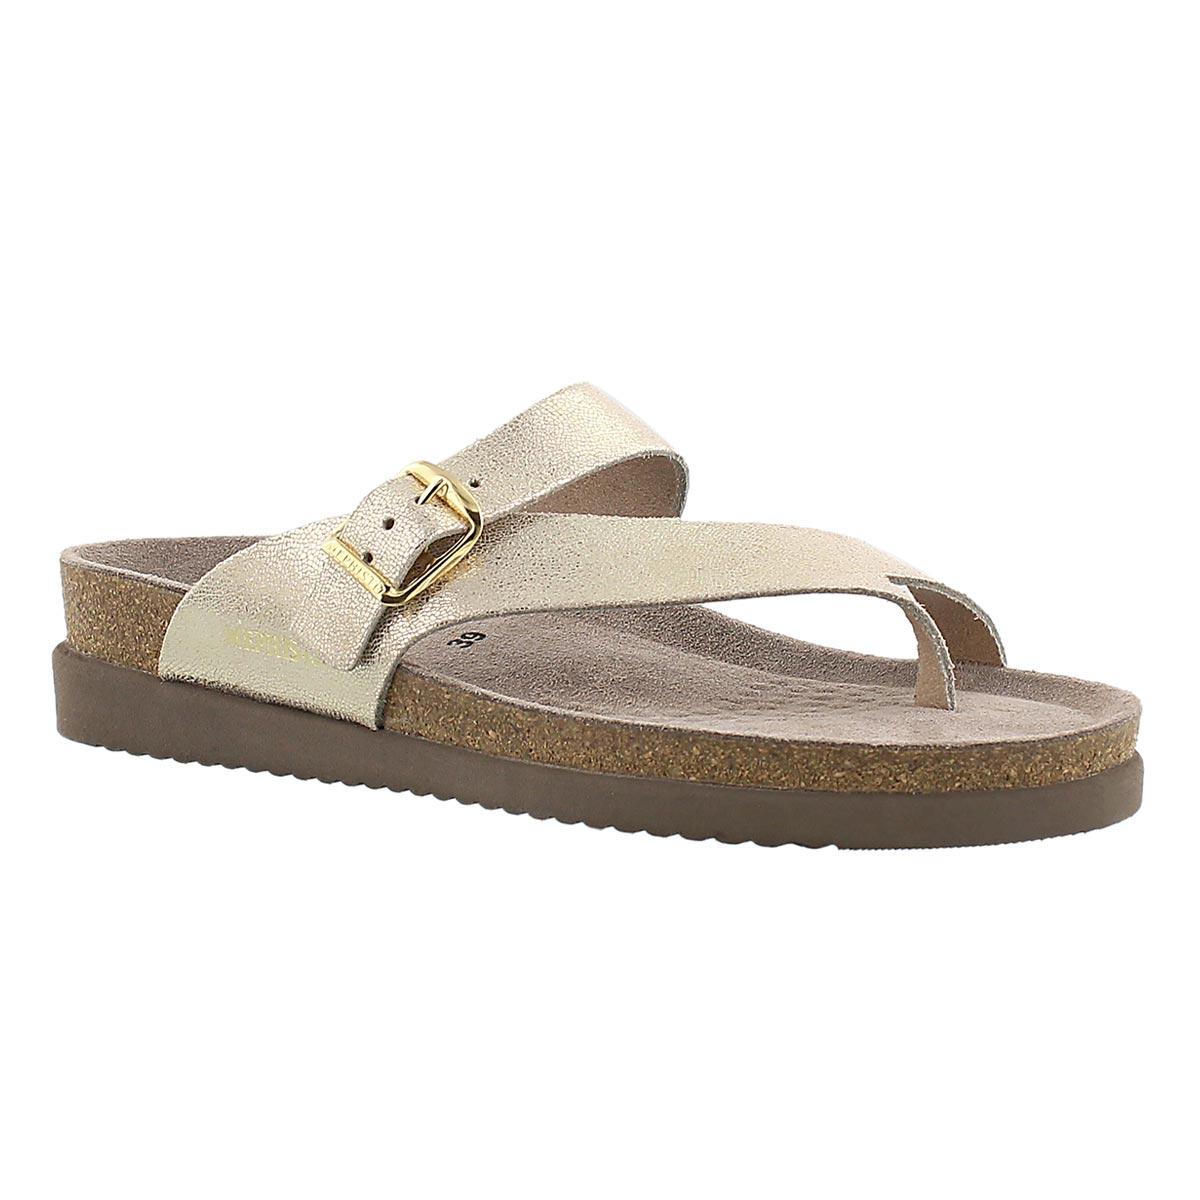 Sandales tongs Helen, platine, femmes